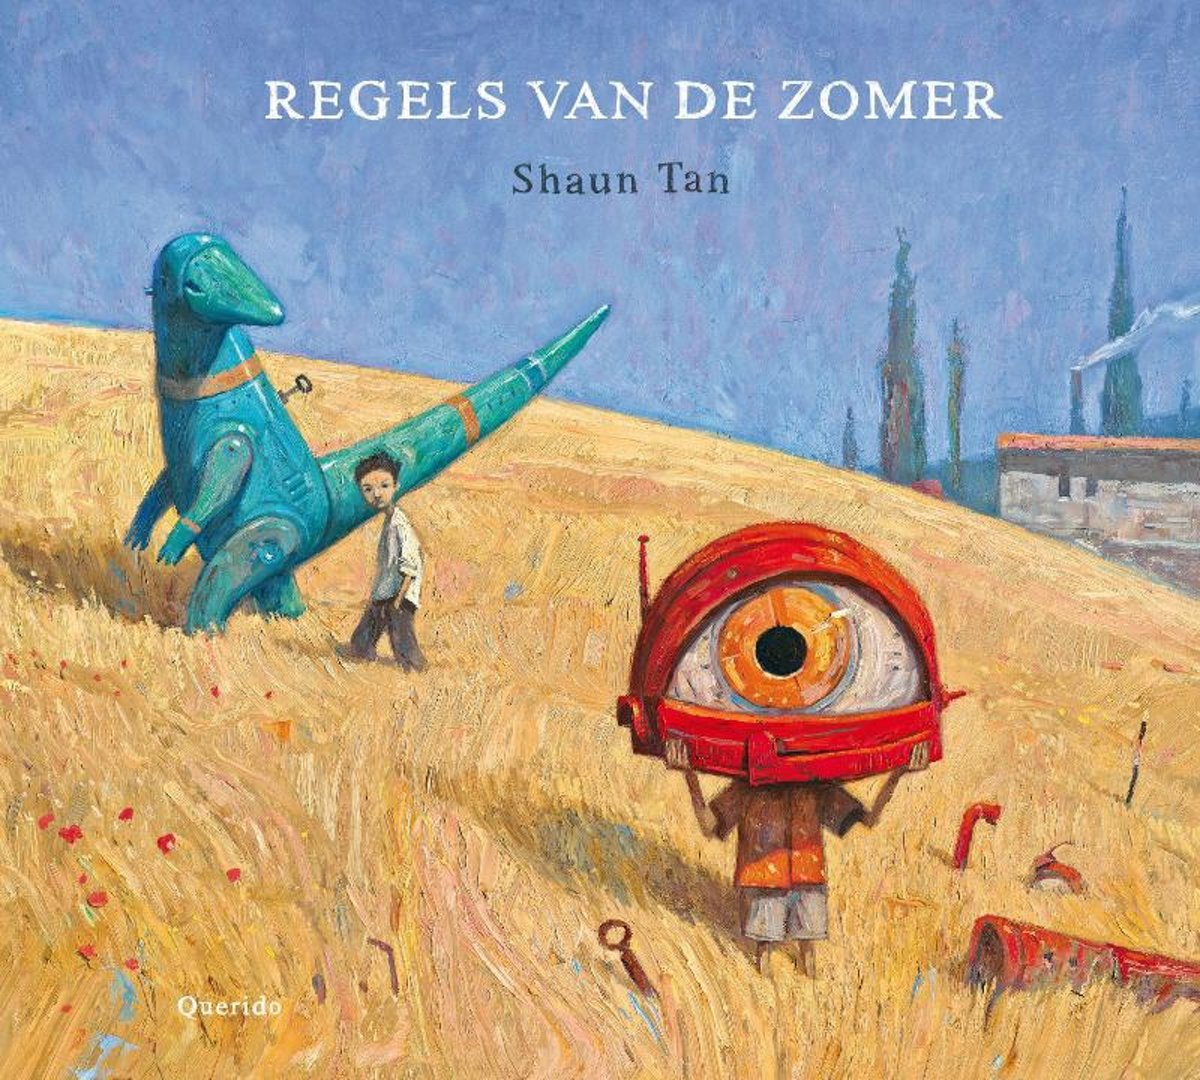 'Regels van de zomer' - Shaun Tan